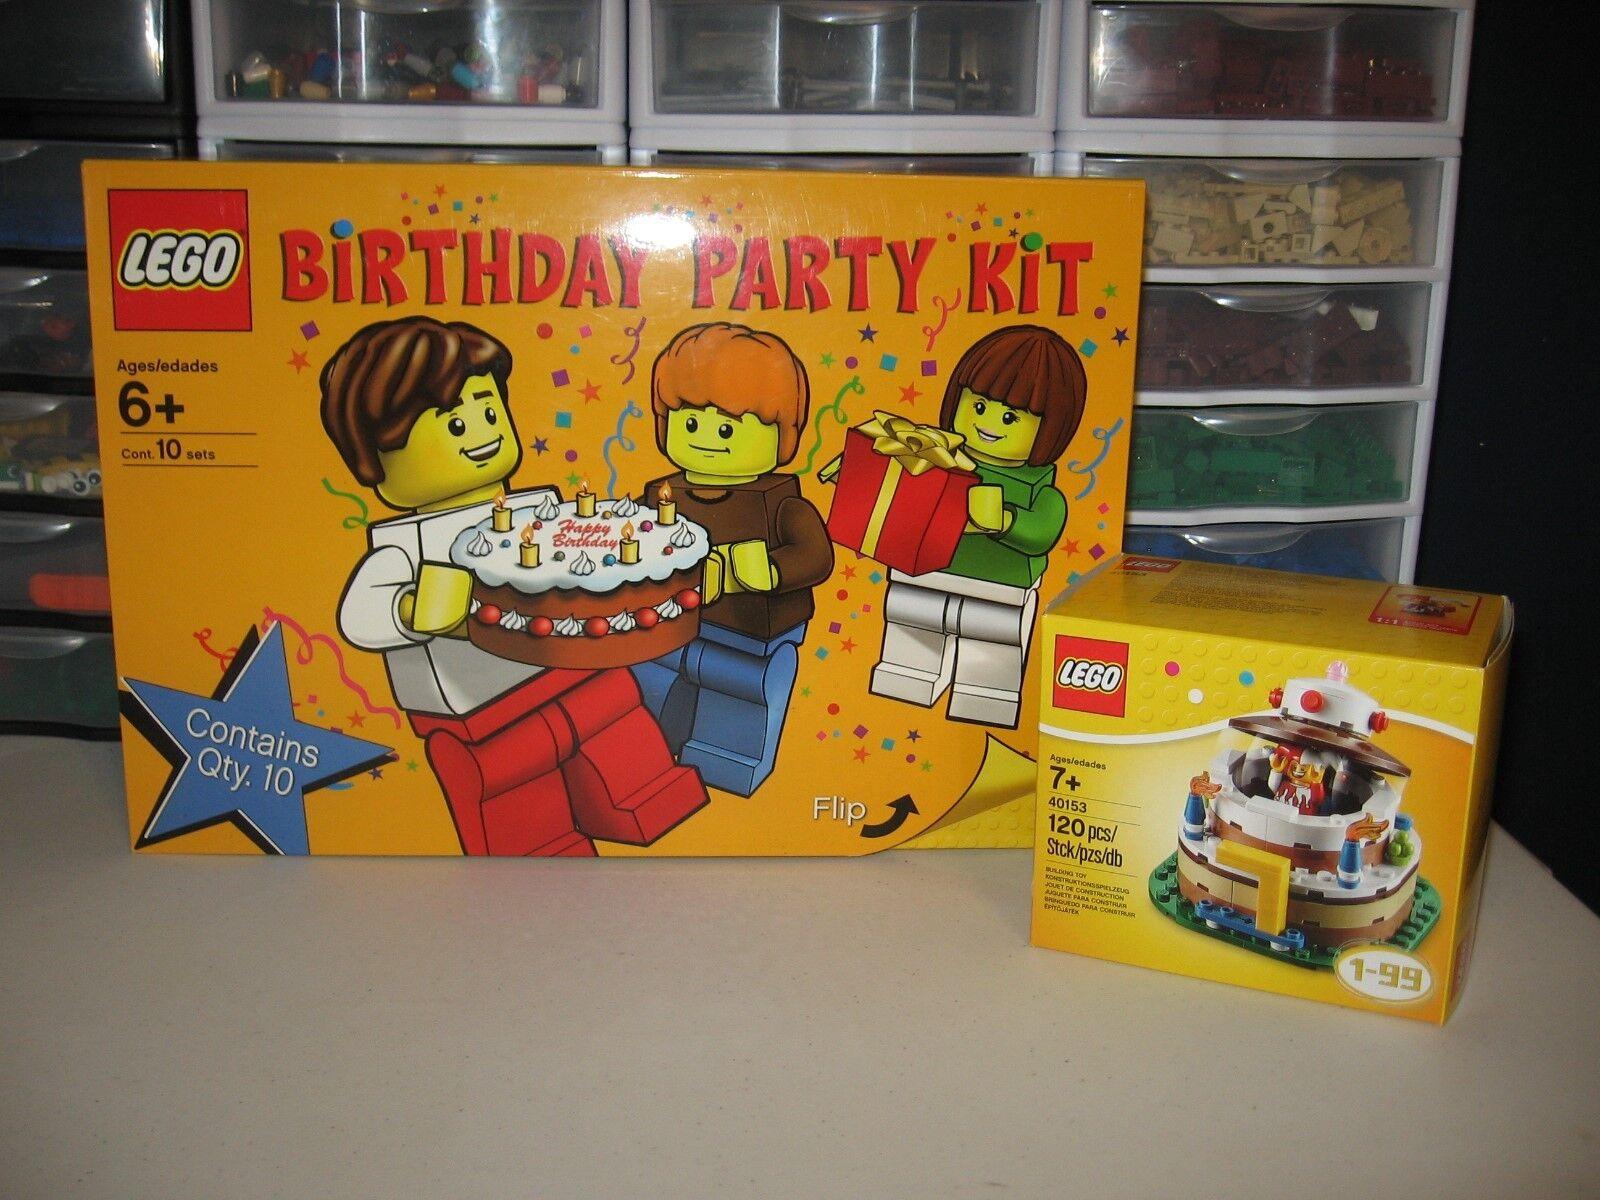 LEGO LEGO LEGO BIRTHDAY PARTY KIT FOR 10 AND LEGO BIRTHDAY TABLE TOP CAKE NIB 813f58